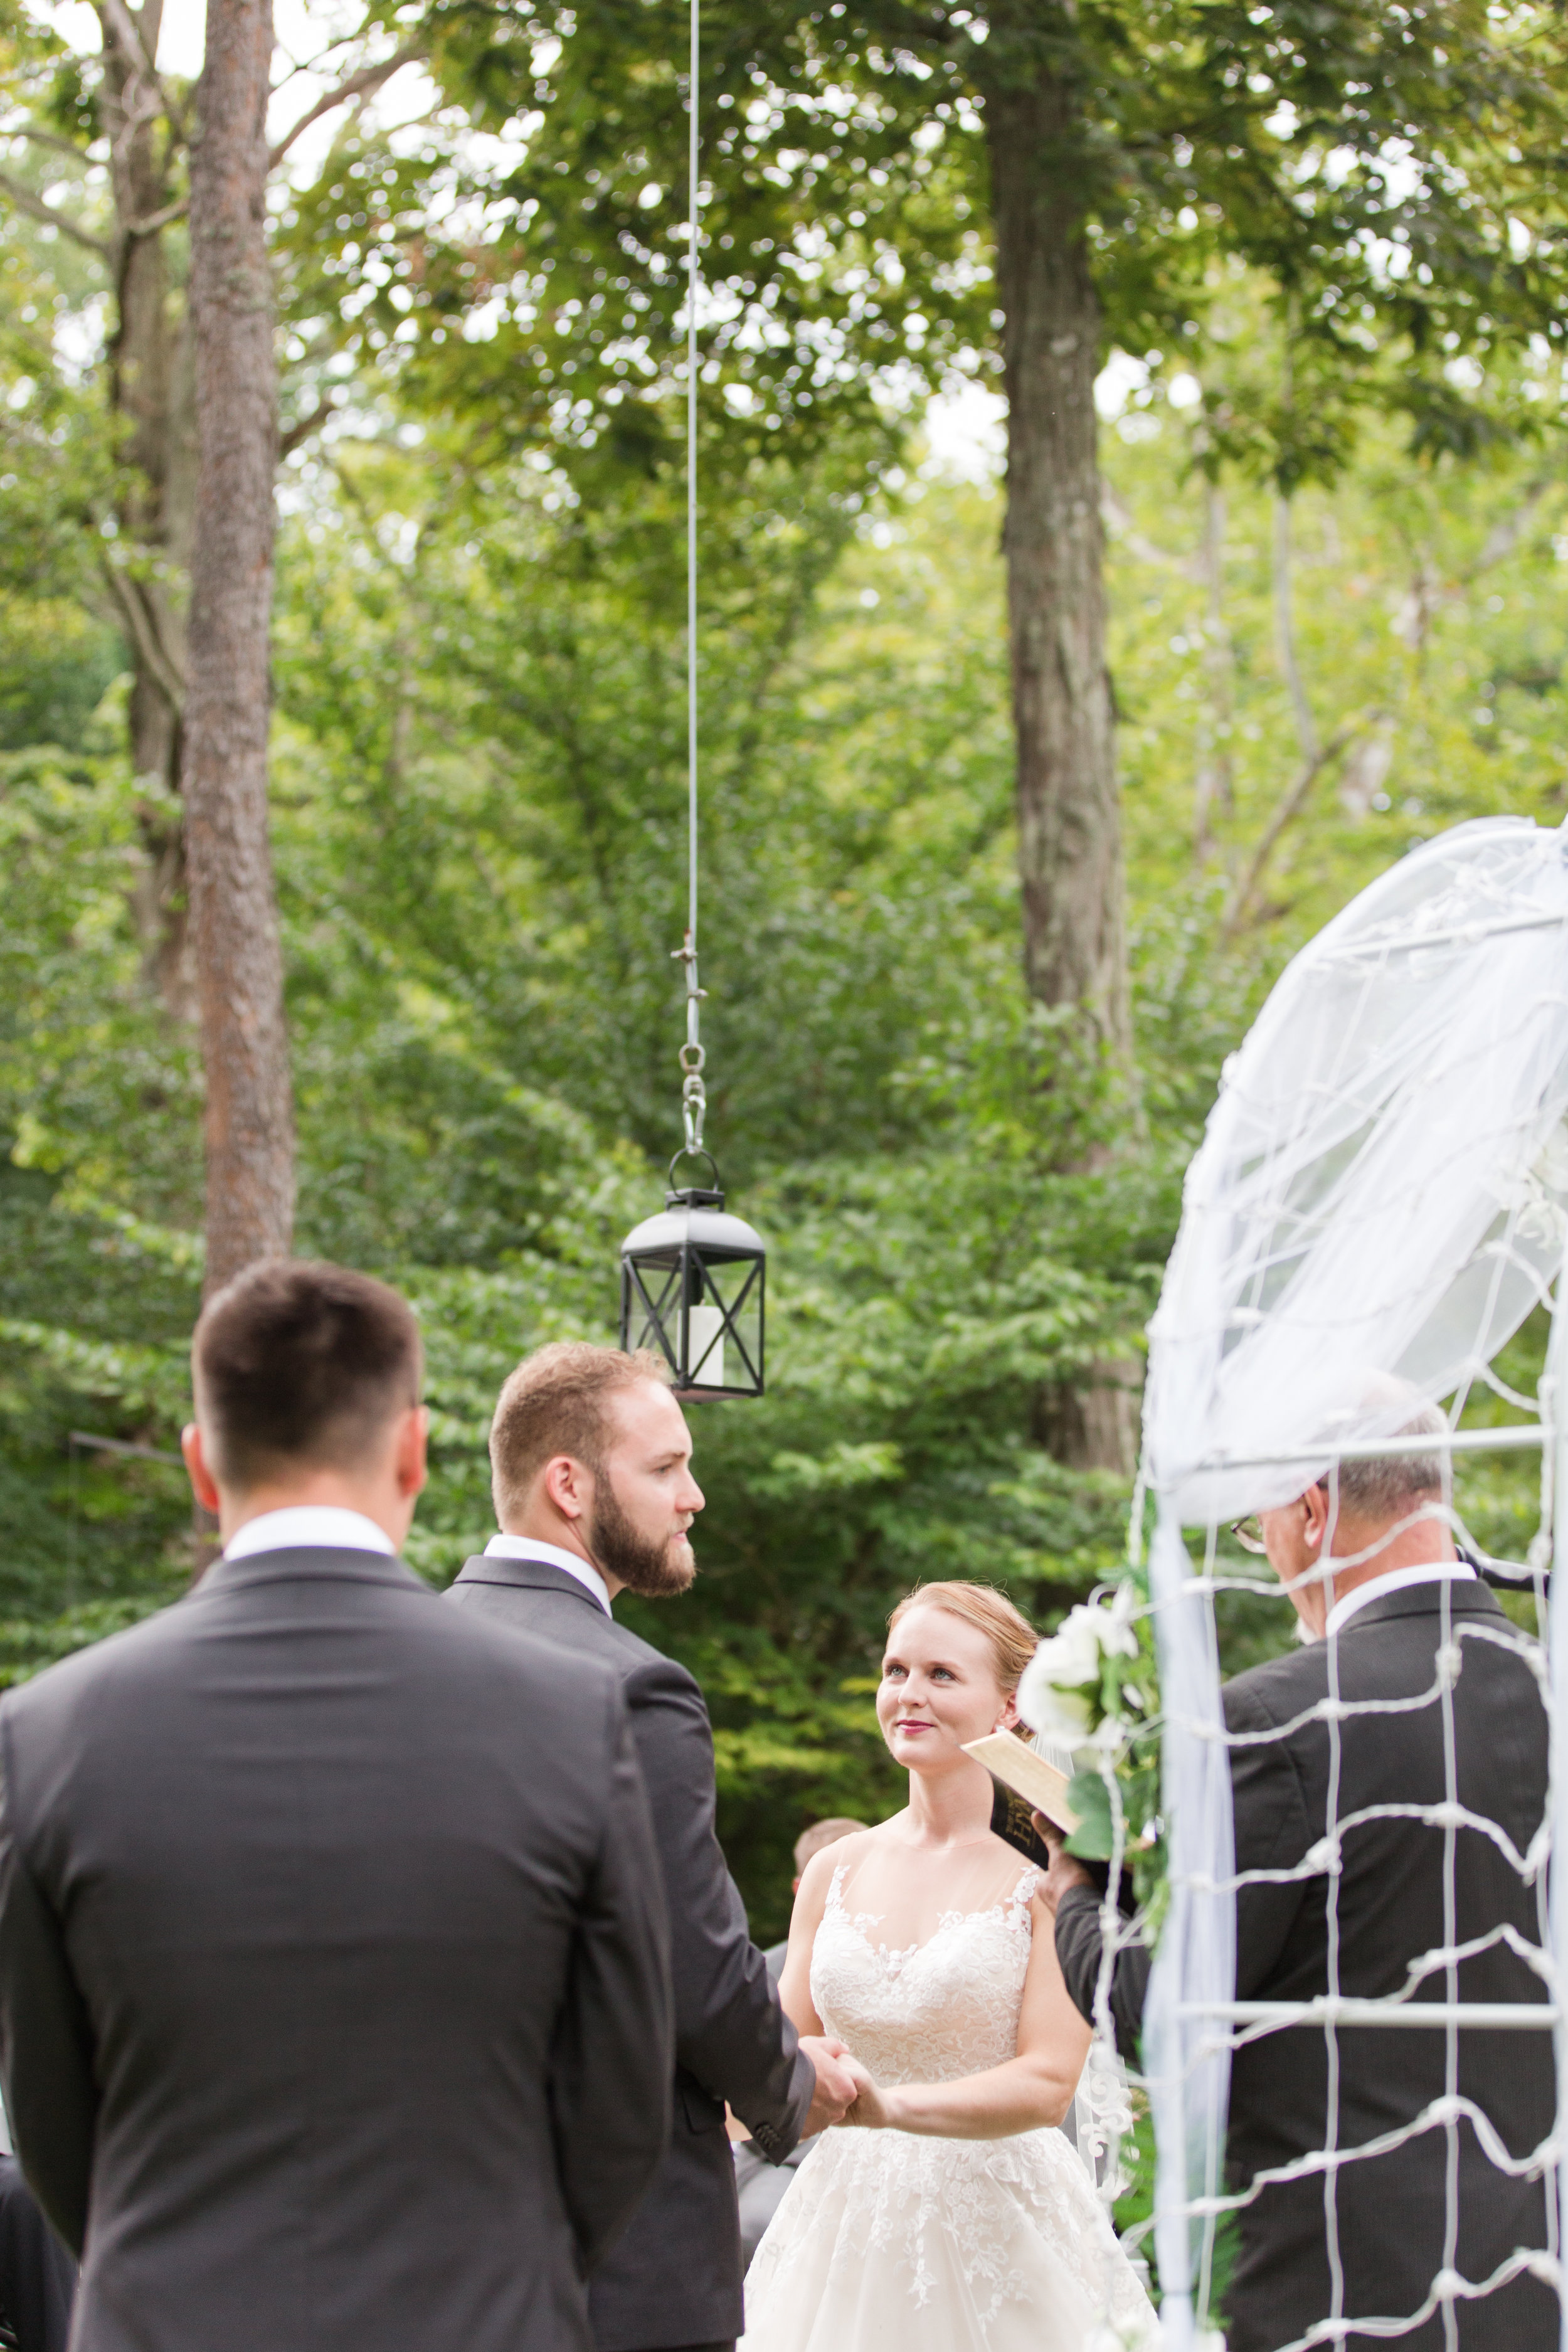 Garton-Demarco Wedding-Ceremony -58.jpg